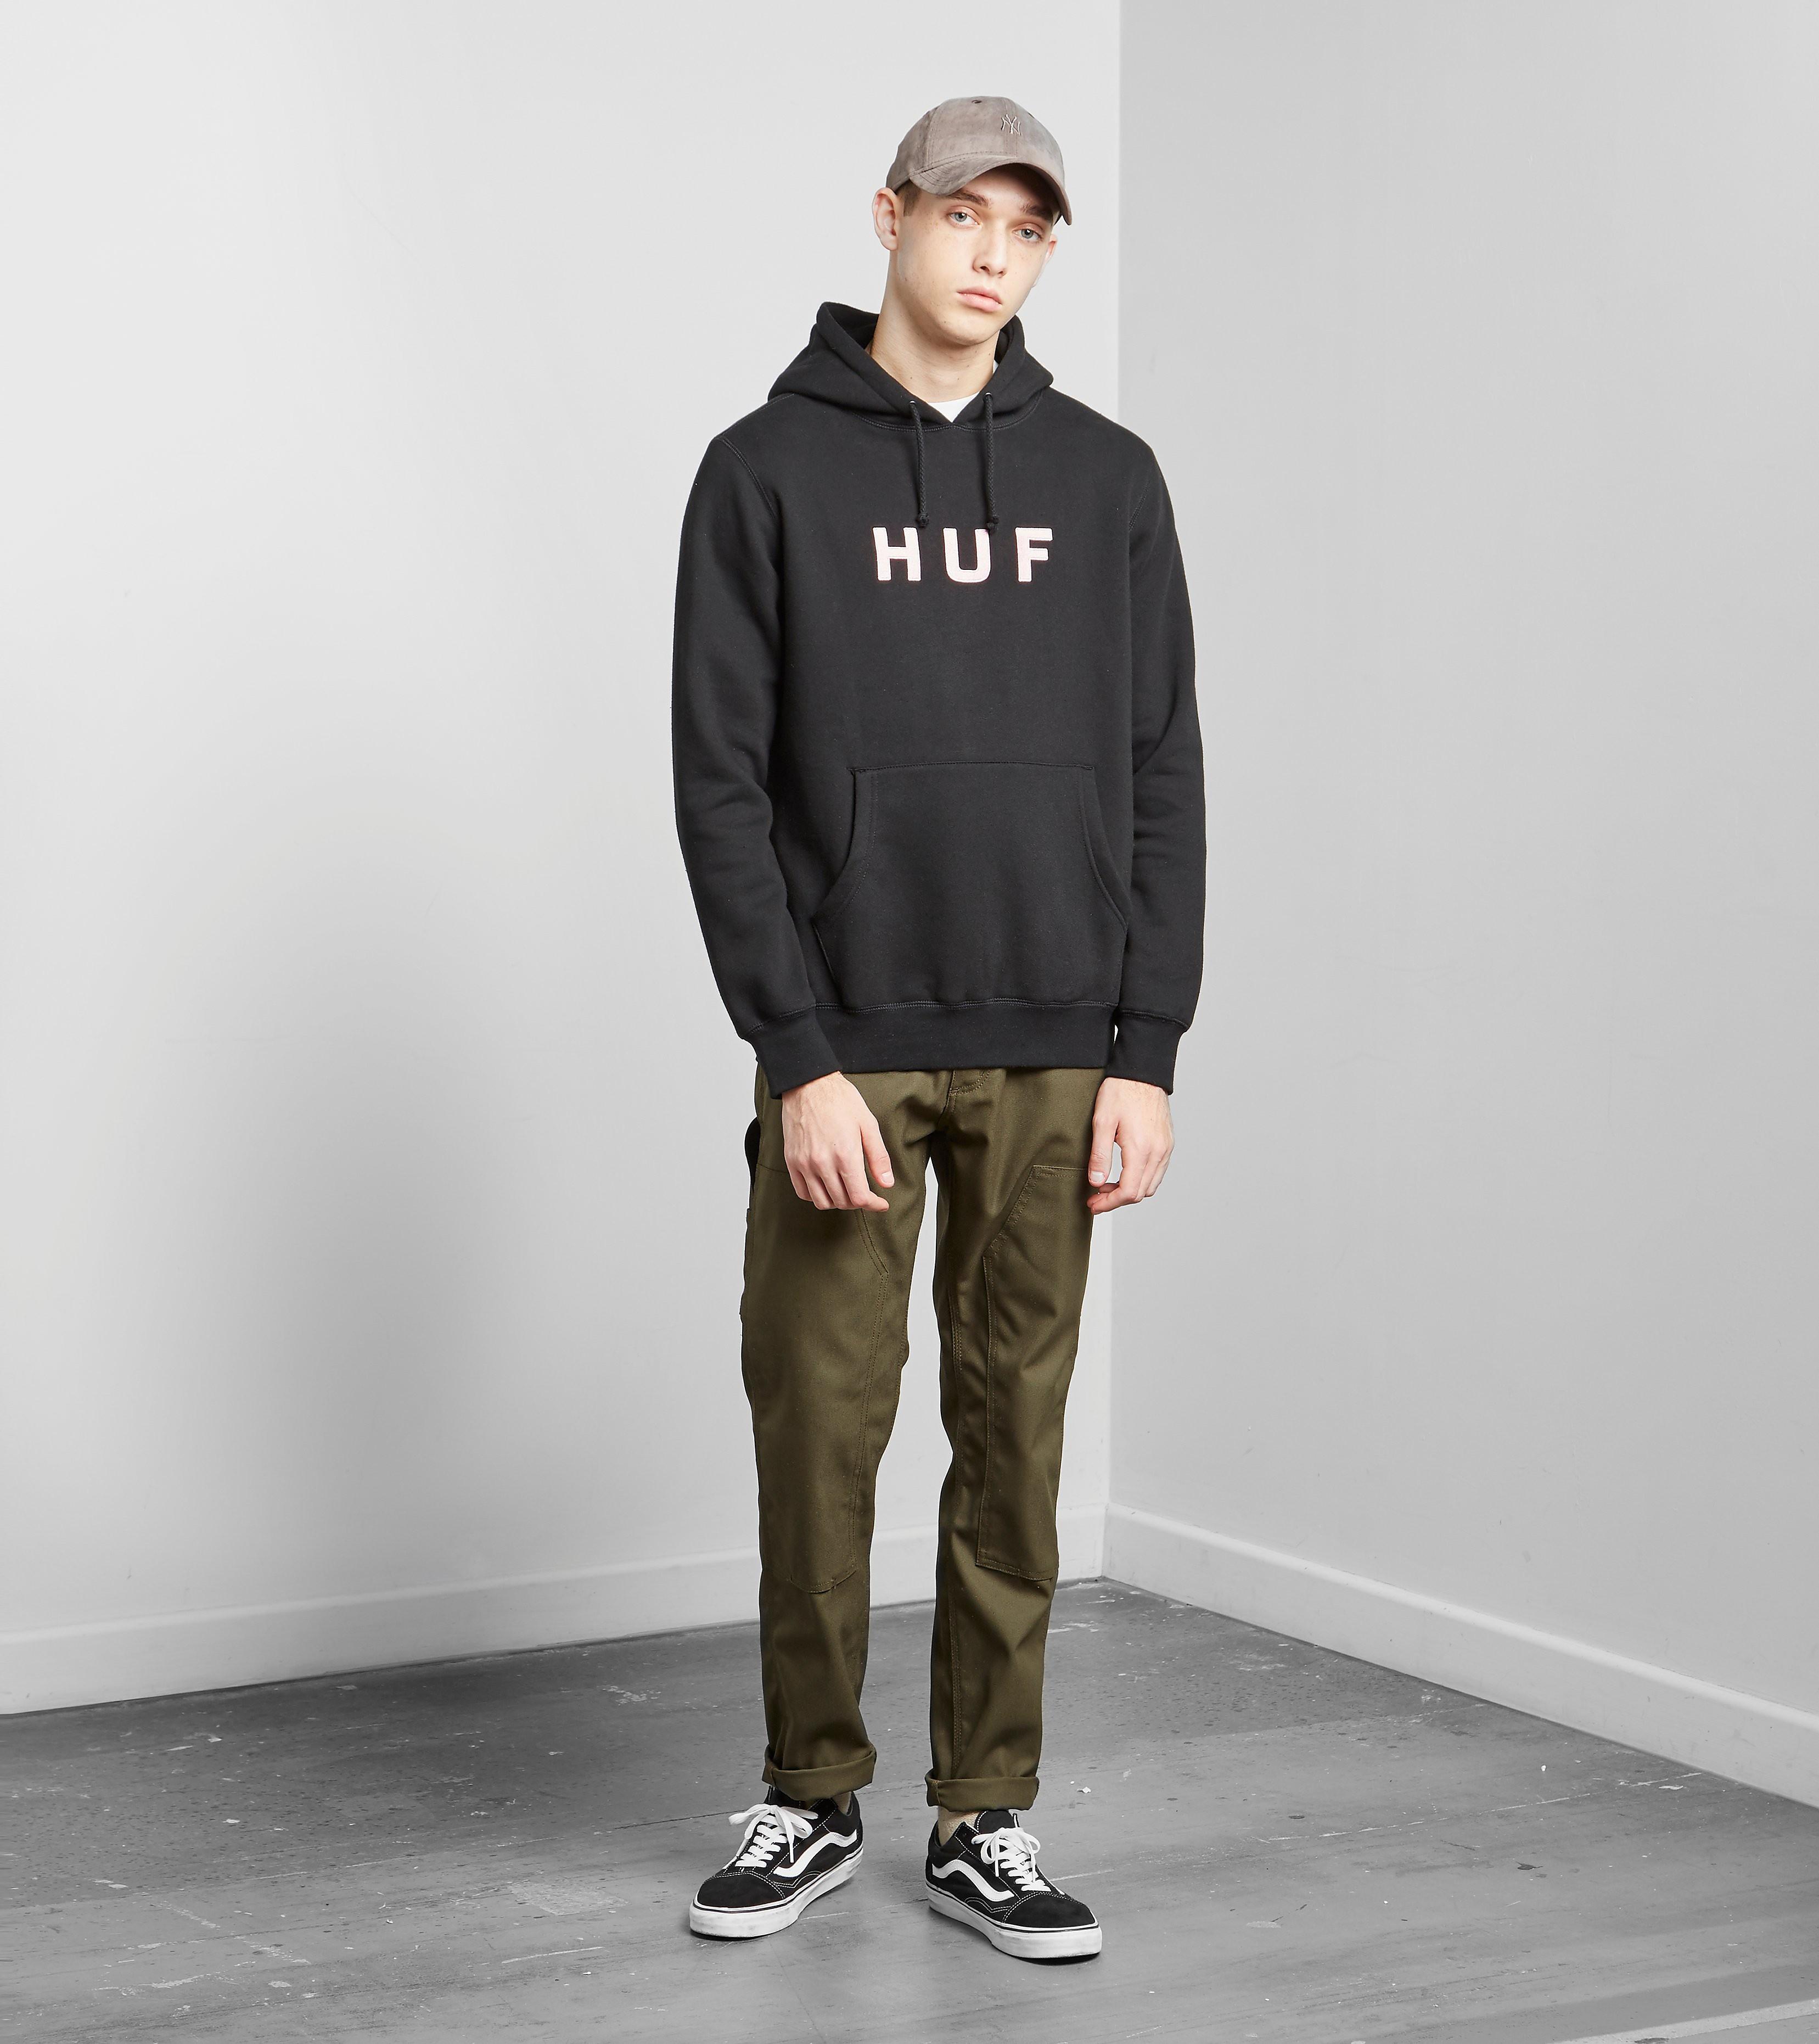 HUF Original Logo Hoody